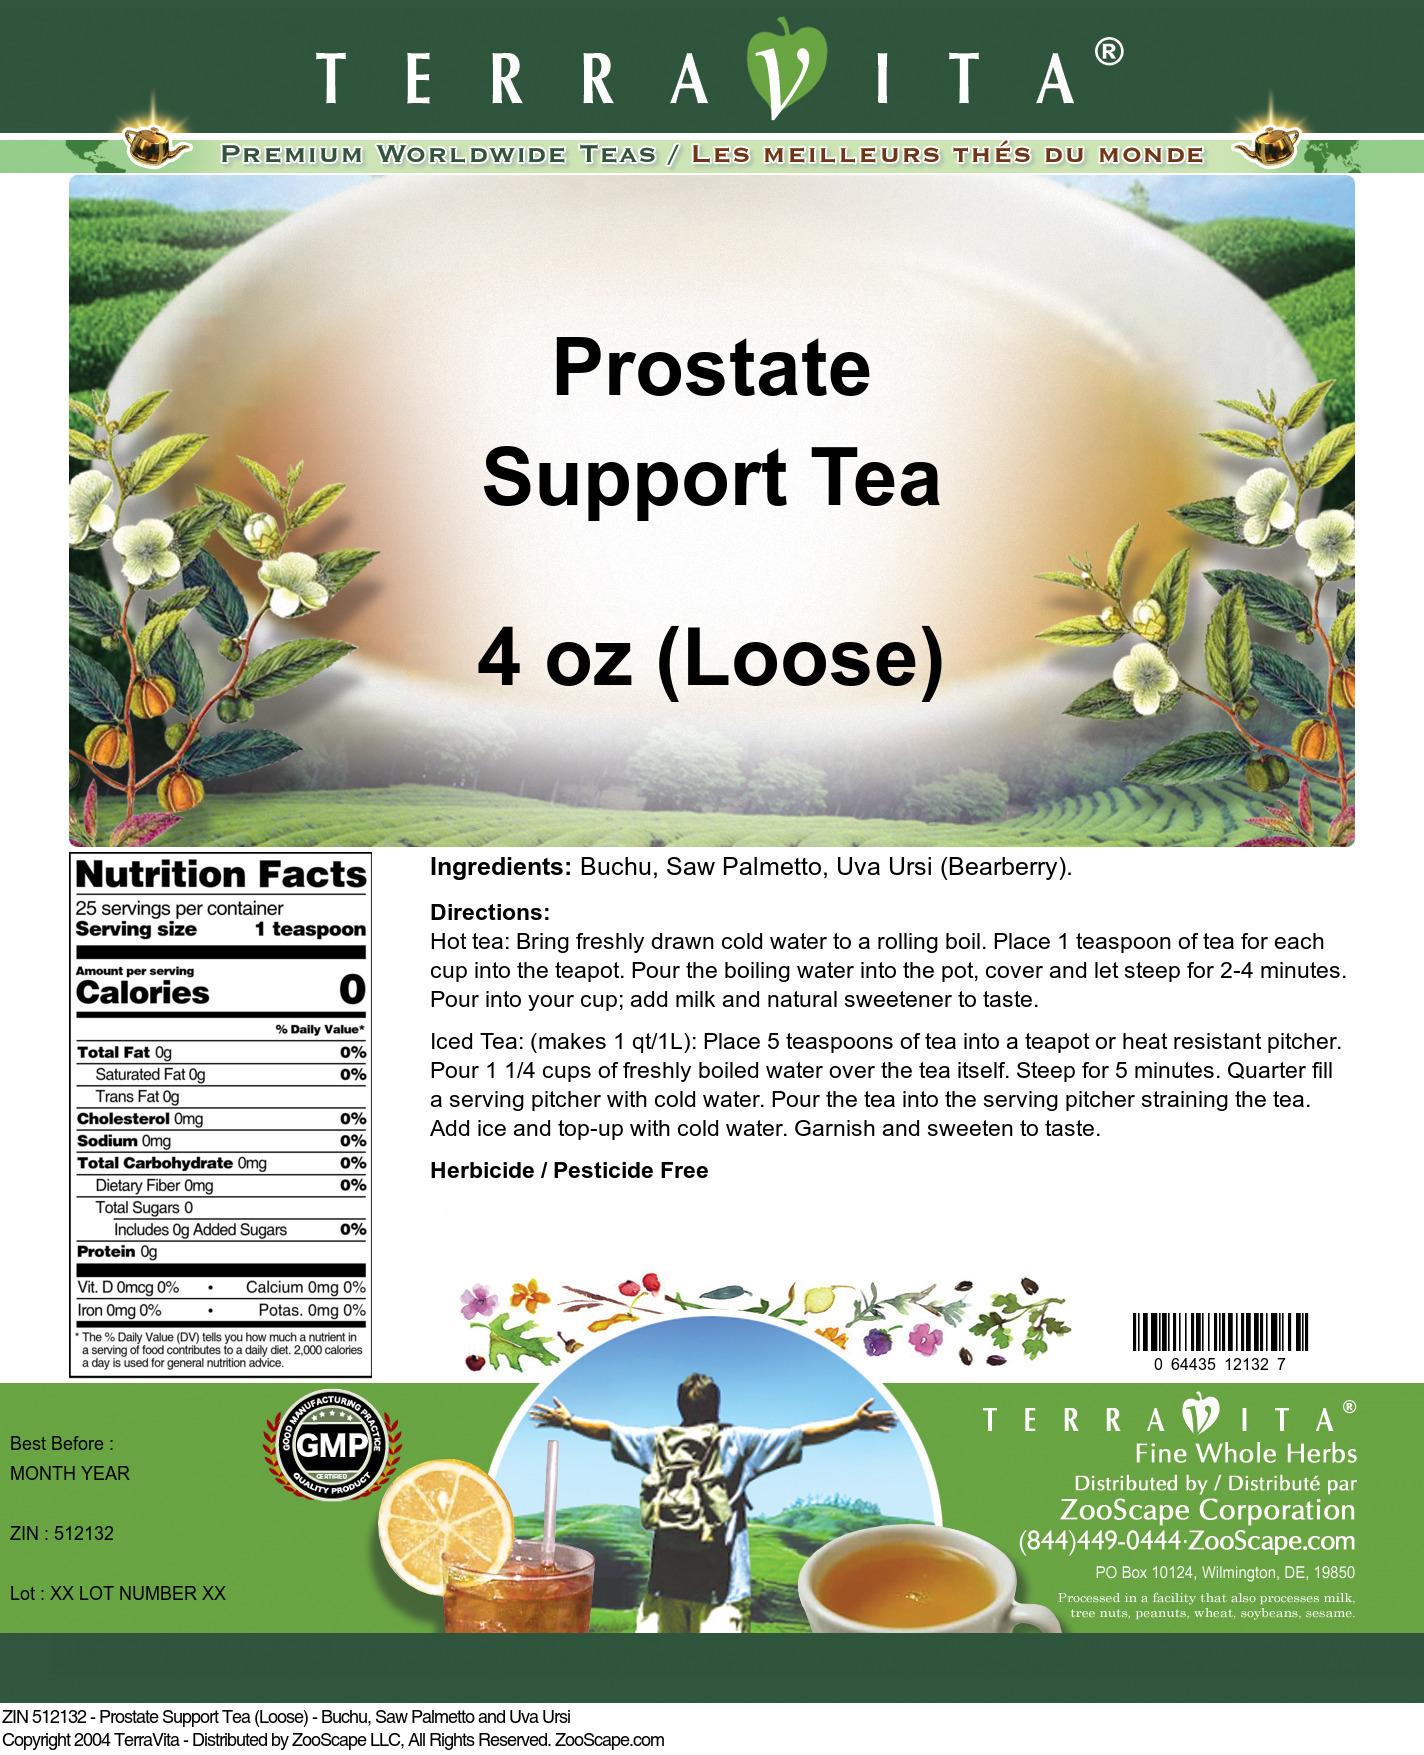 Prostate Support Tea (Loose) - Buchu, Saw Palmetto and Uva Ursi